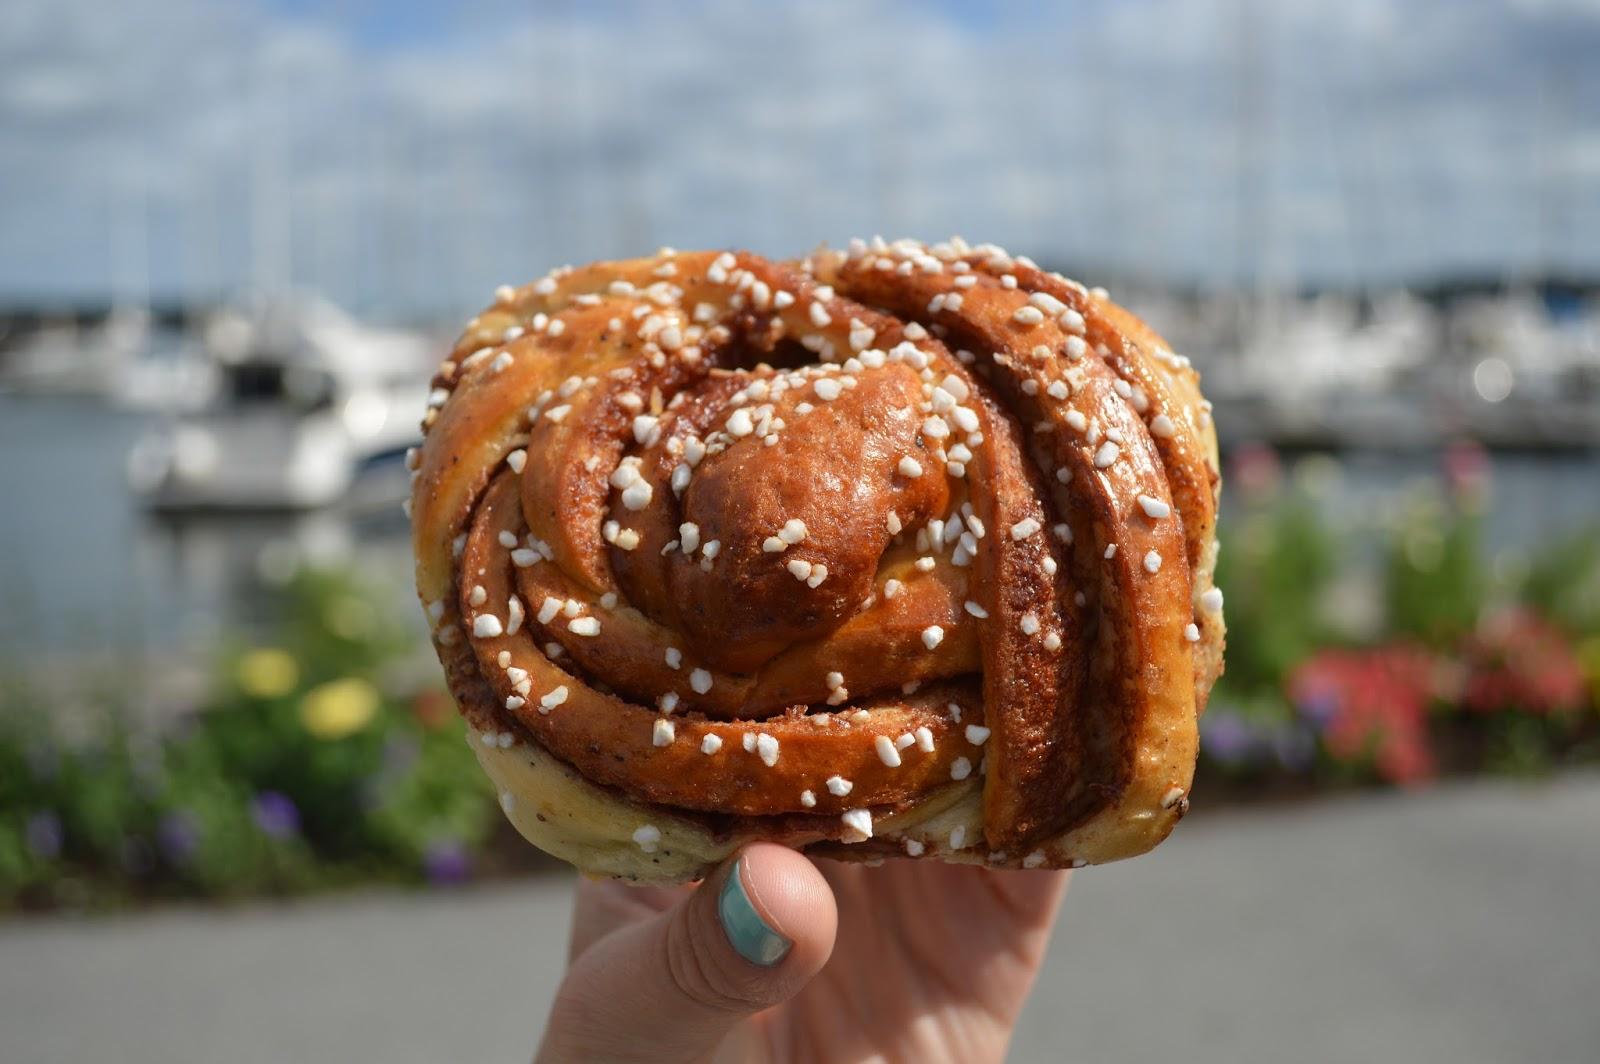 Kanelbulle swedish cinnamon bun fika